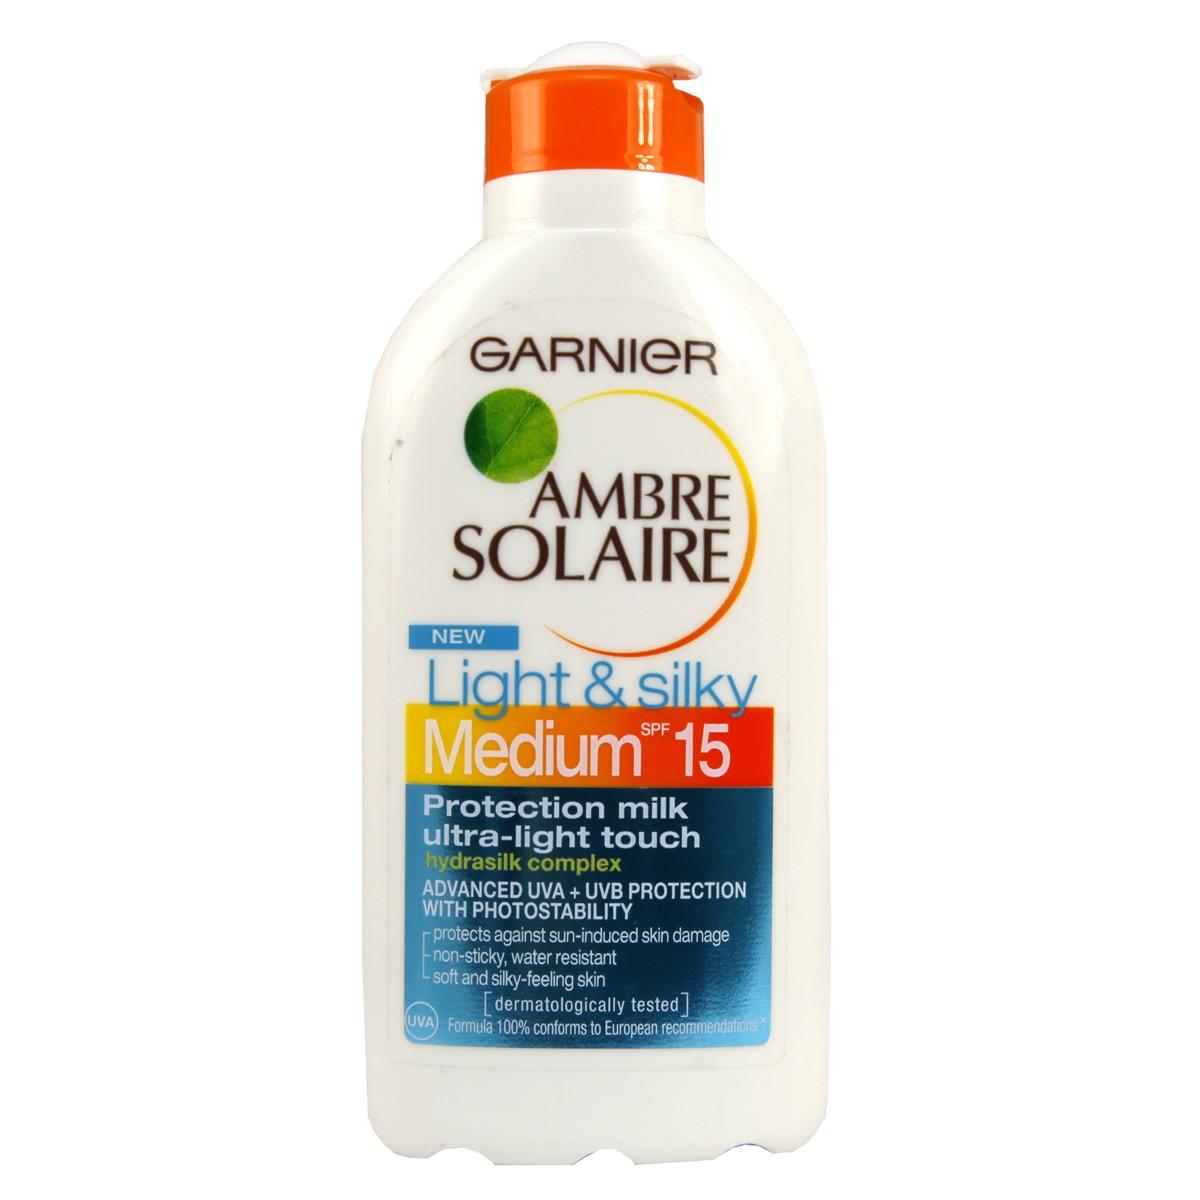 Garnier Ambre Solaire Light & Silky Milk SPF 15